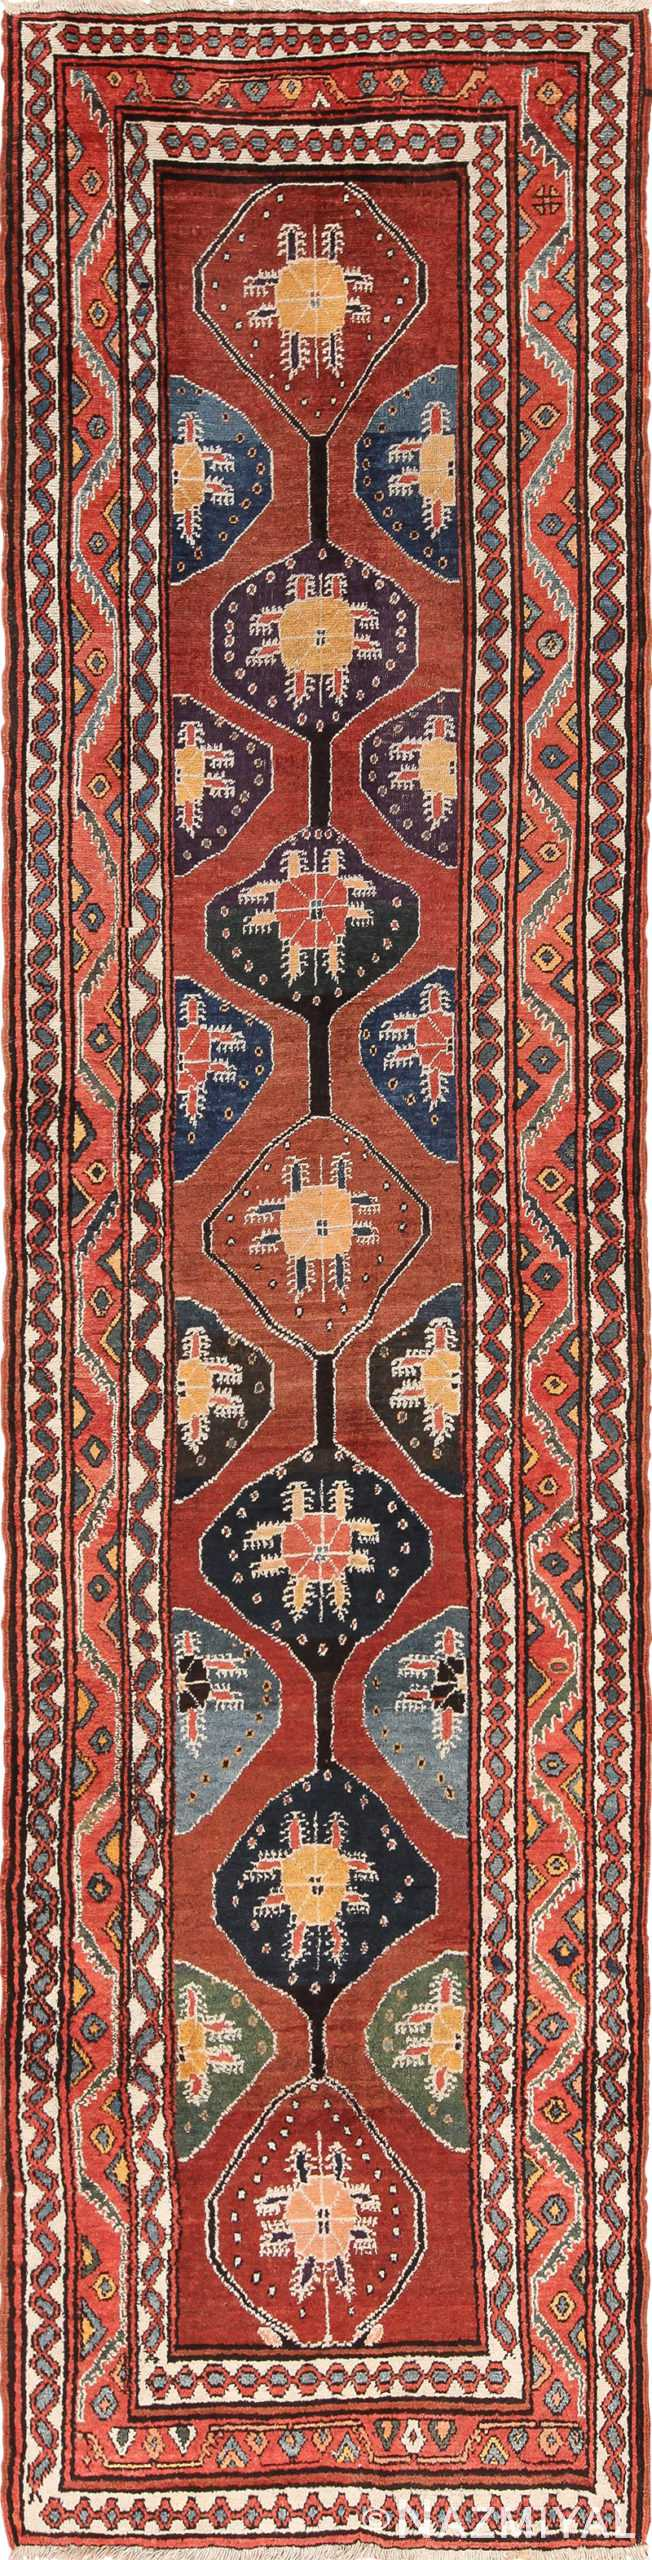 Antique Tribal Northwest Persian Runner Rug 49721 - Nazmiyal